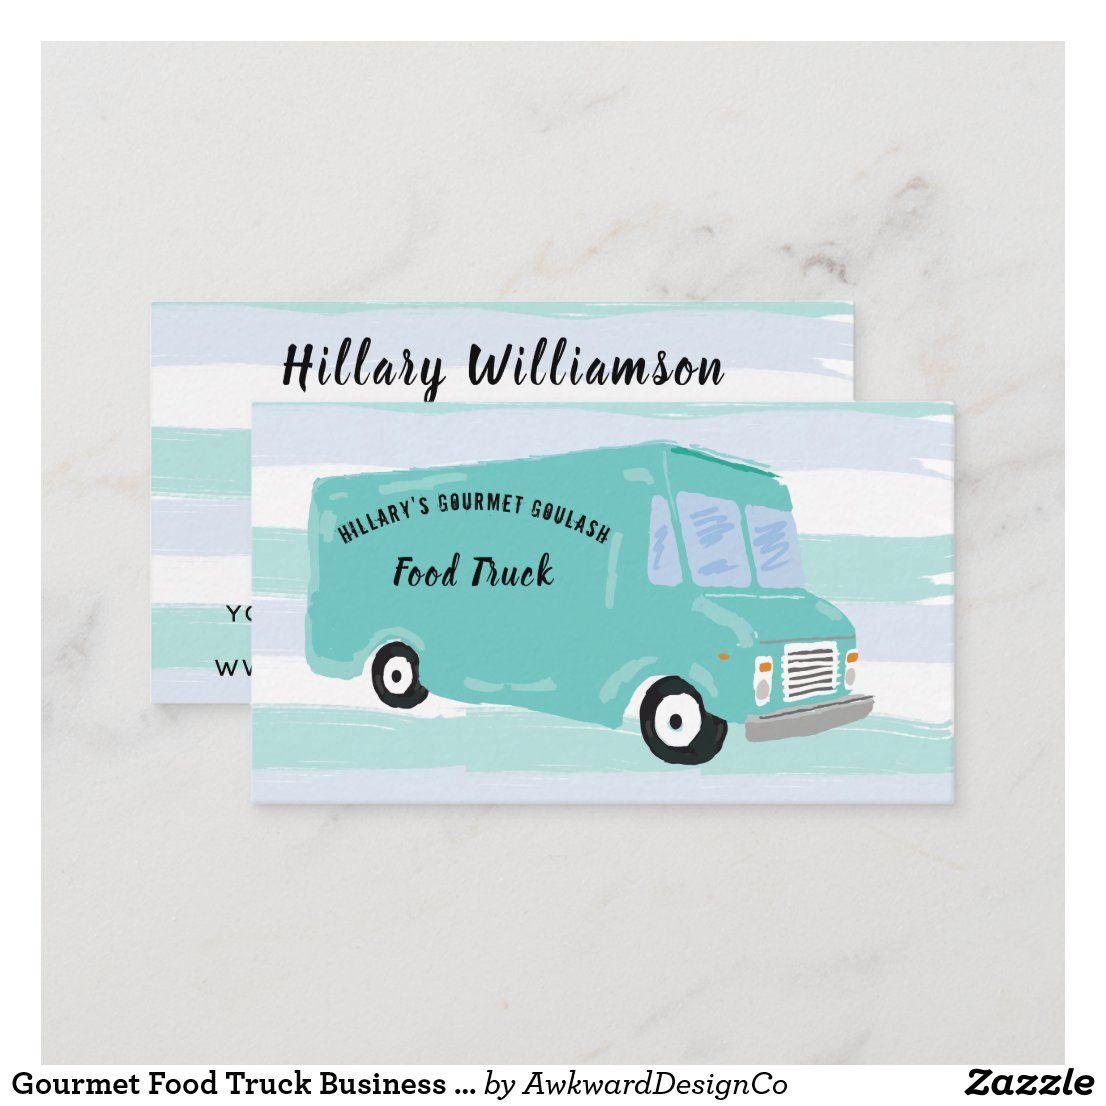 Gourmet Food Truck Business Cards Zazzle Com Food Truck Business Gourmet Recipes Food Truck